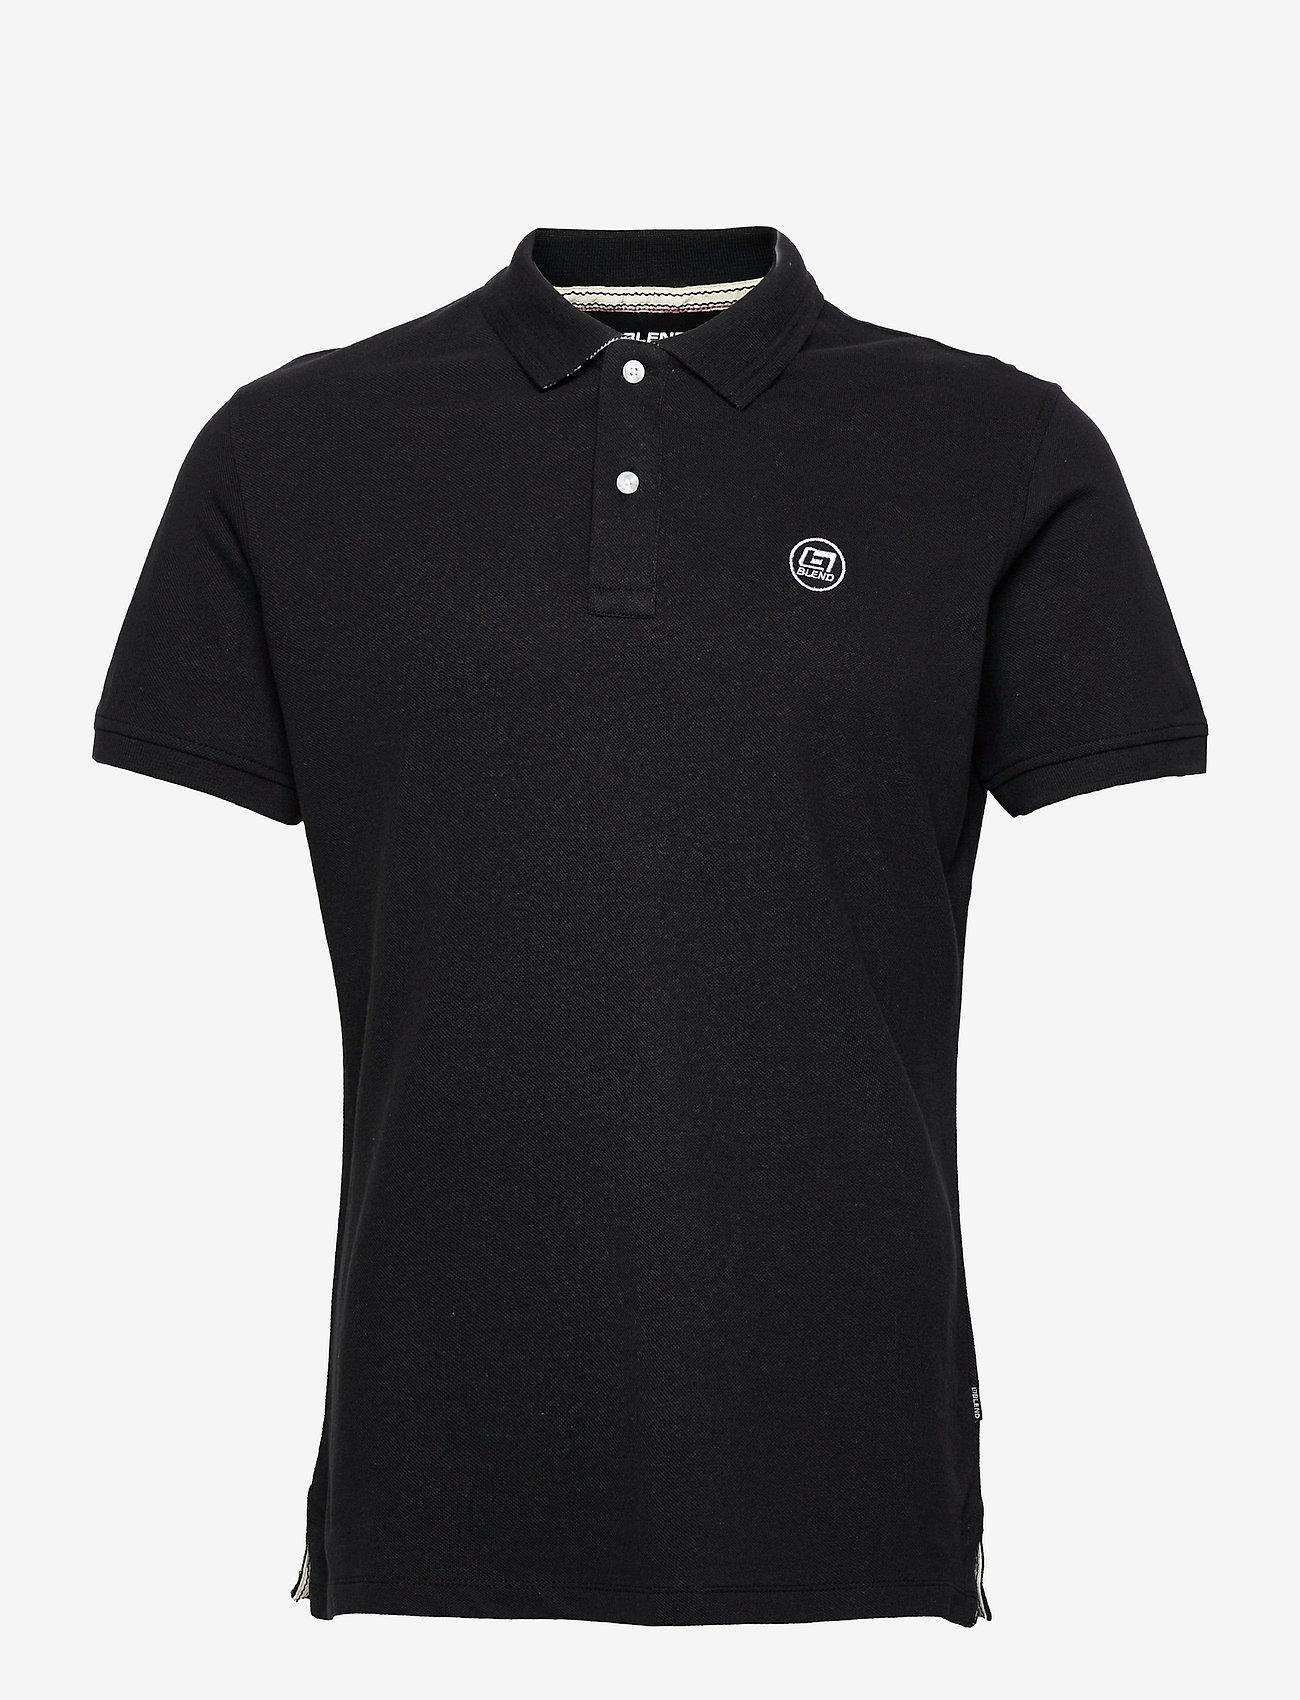 Blend - Poloshirt - poloshirts - black - 0